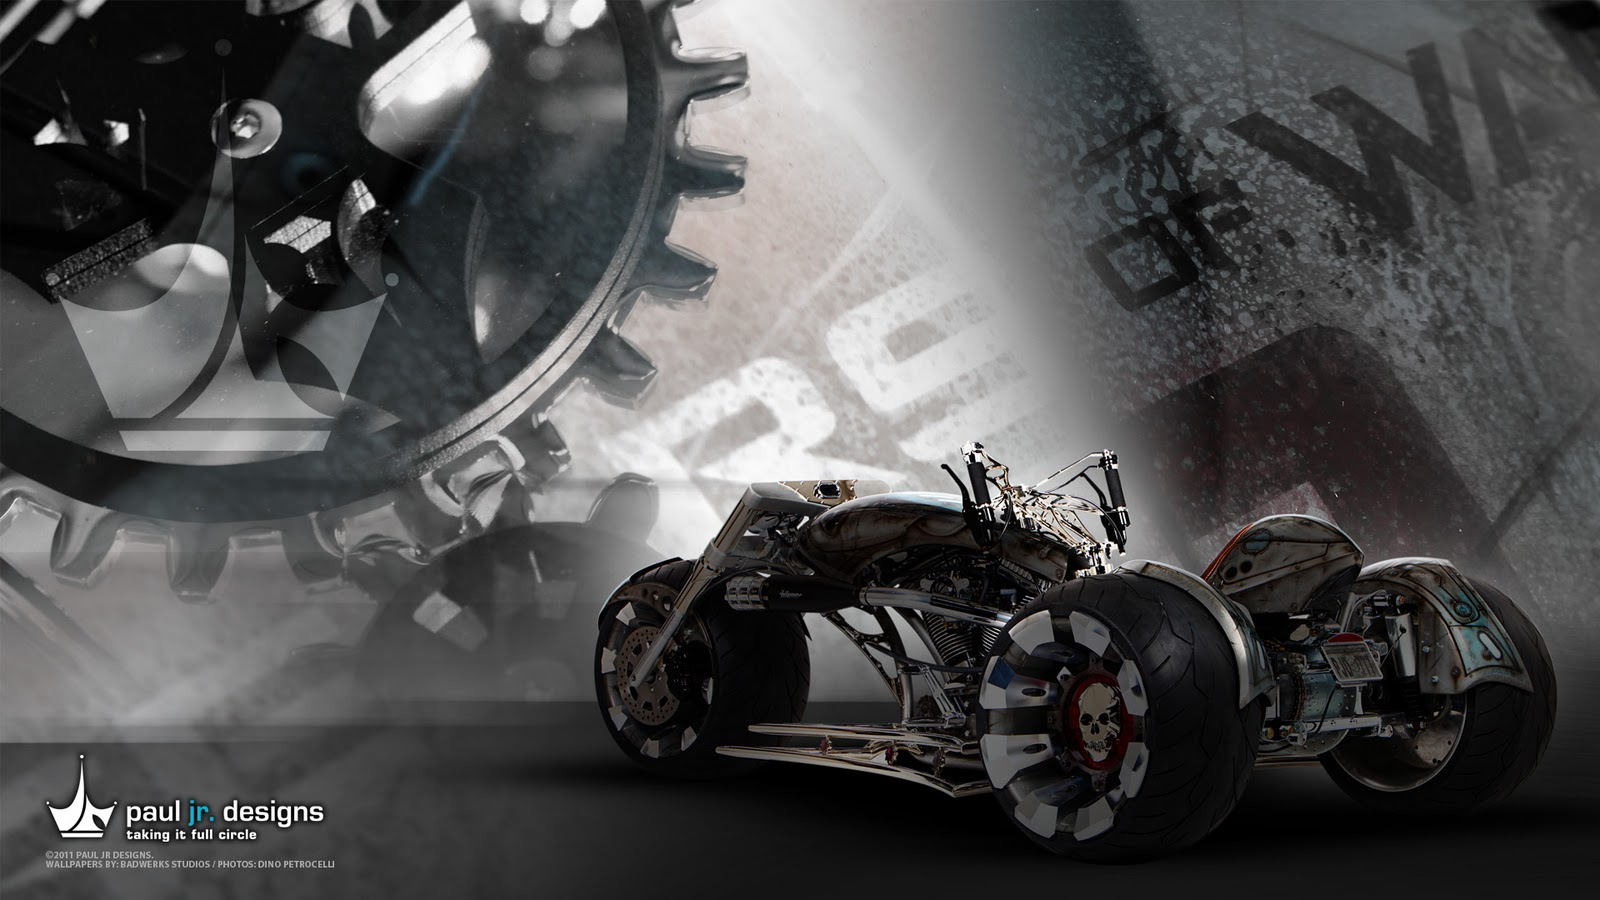 http://2.bp.blogspot.com/-XJ87MFnqmF8/TskYVEQMowI/AAAAAAAADUE/3YoGNNyw7KU/s1600/paul+jr+designs+2.jpg